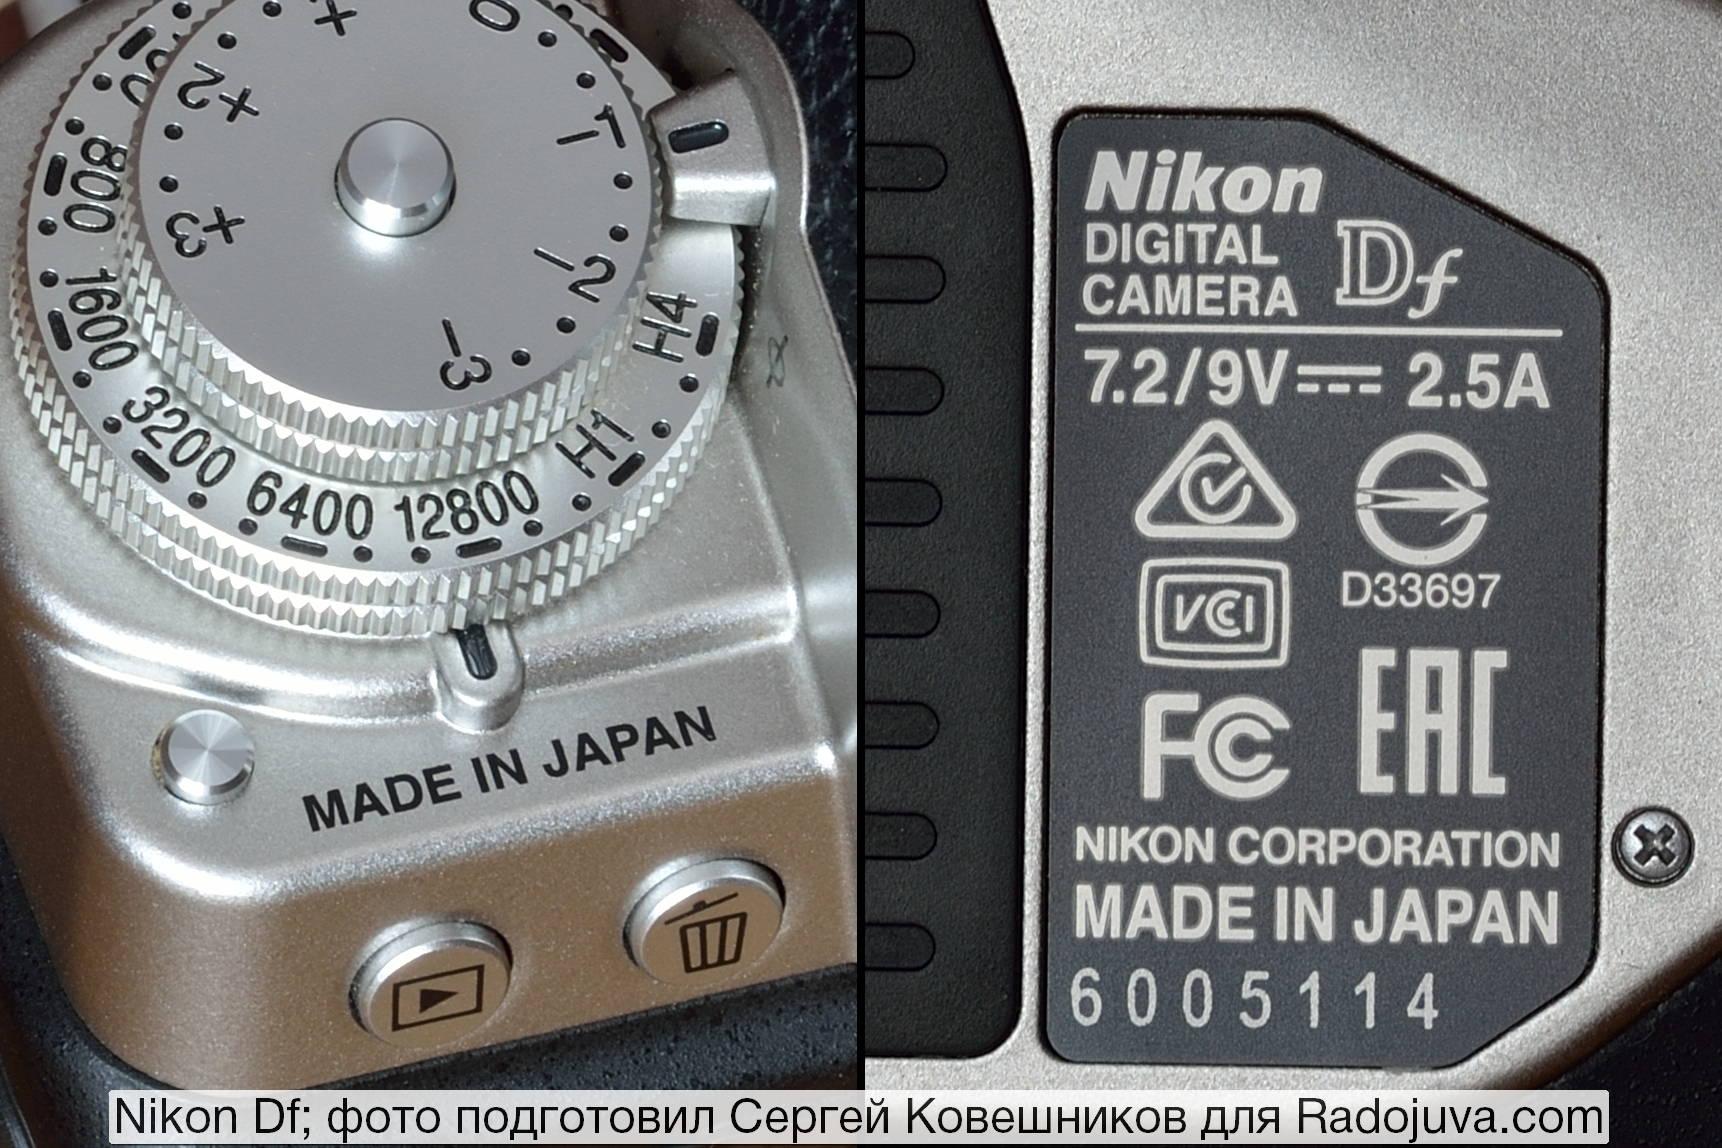 Nikon DF – made in Japan